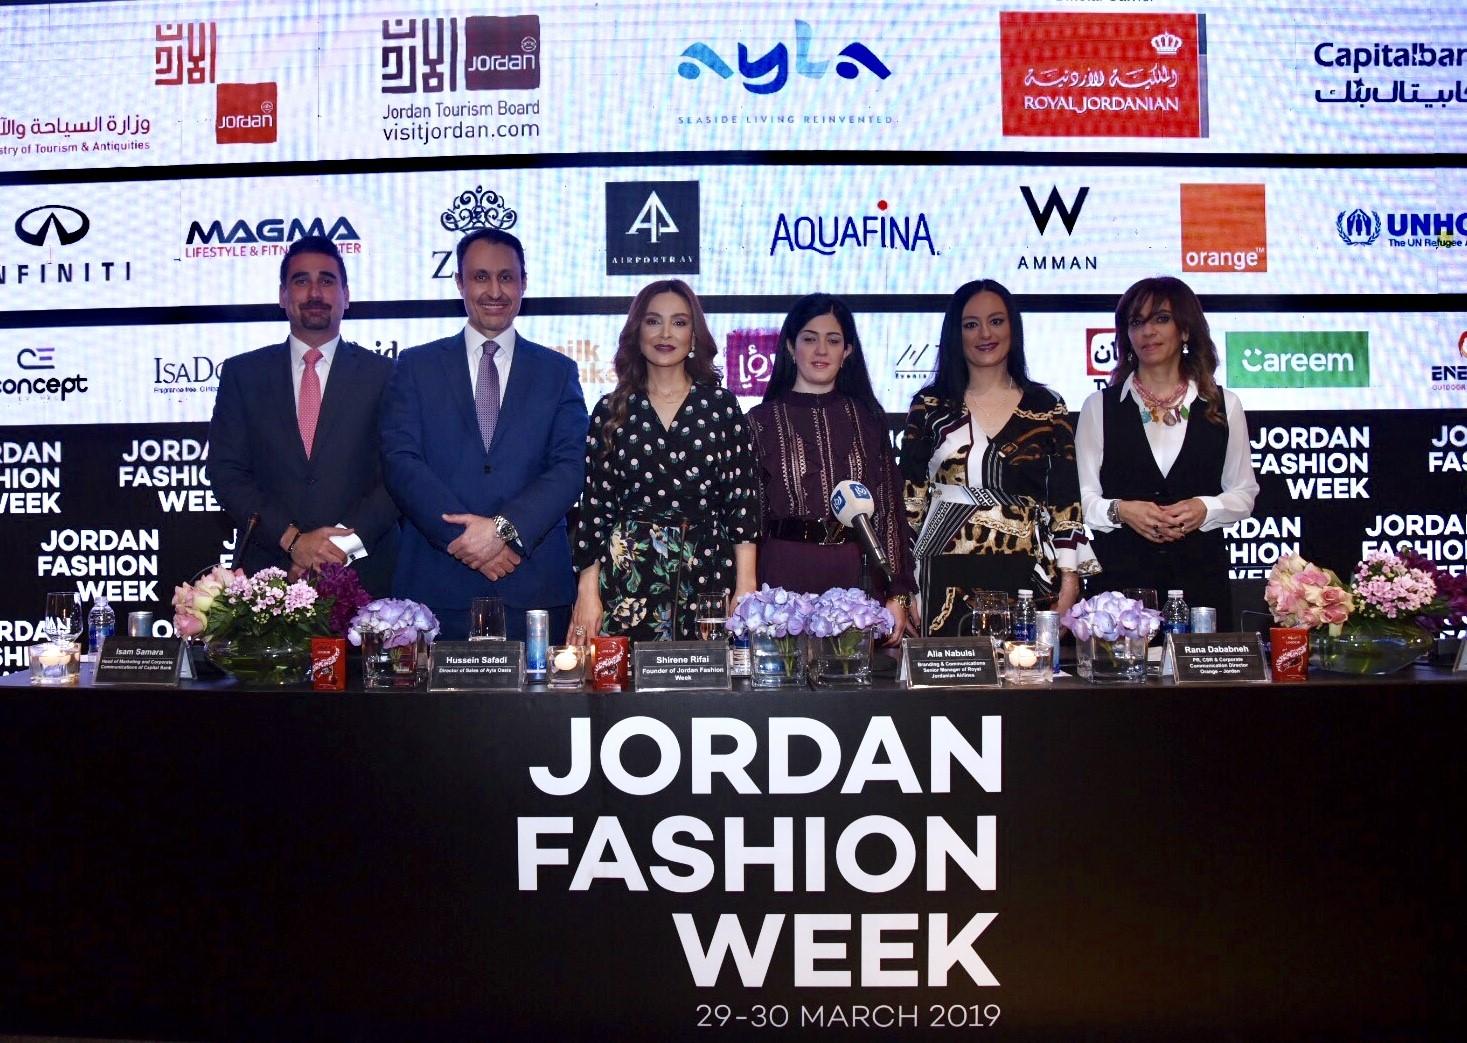 Jordan Fashion Week 2019 Press Conference: Launching Jordan's Official Fashion Week